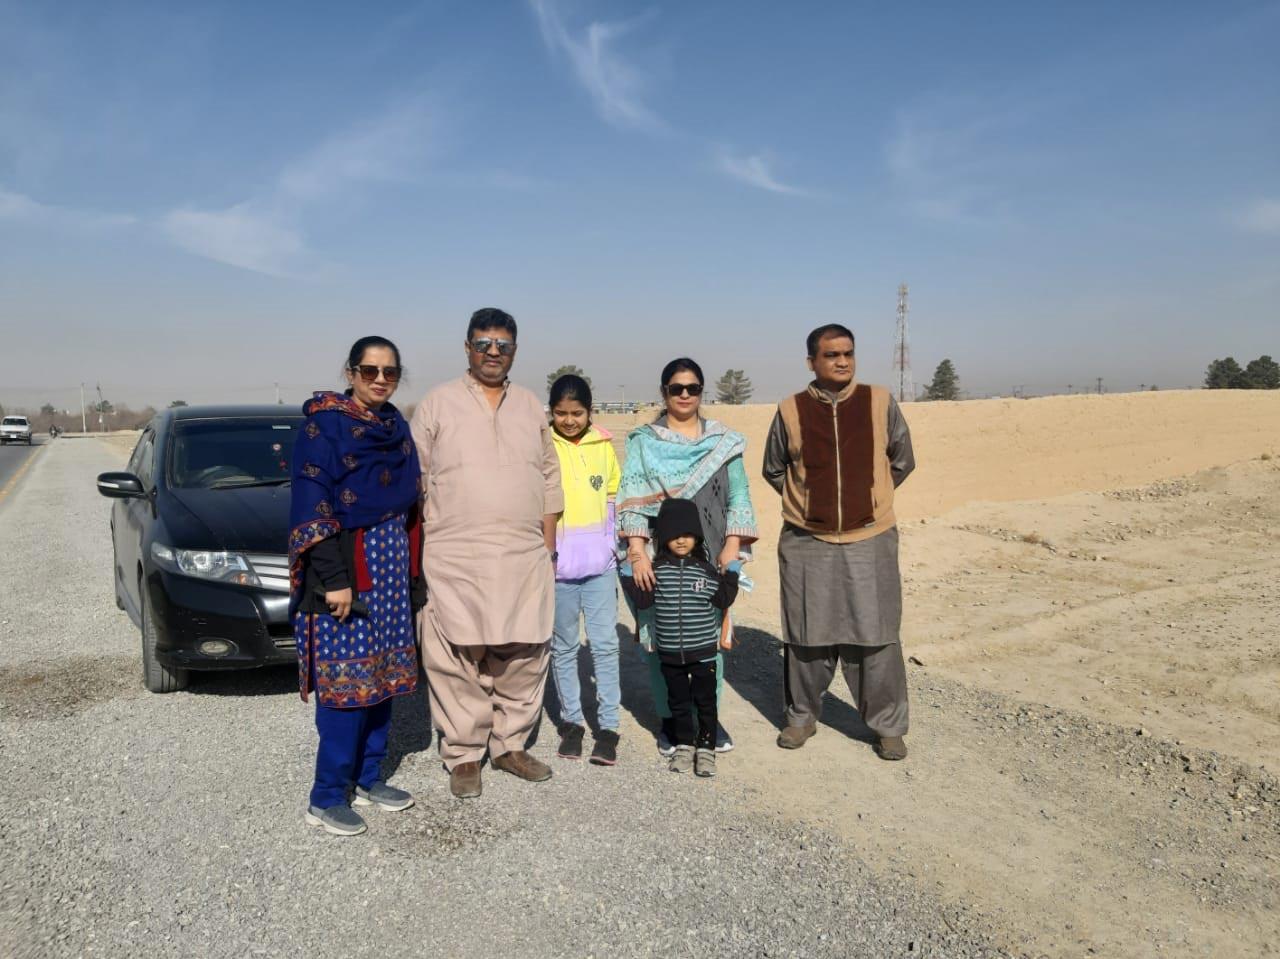 Erum, Imran, Zara, Ayesha, Farhat and Adnan on their way to Ziarat.